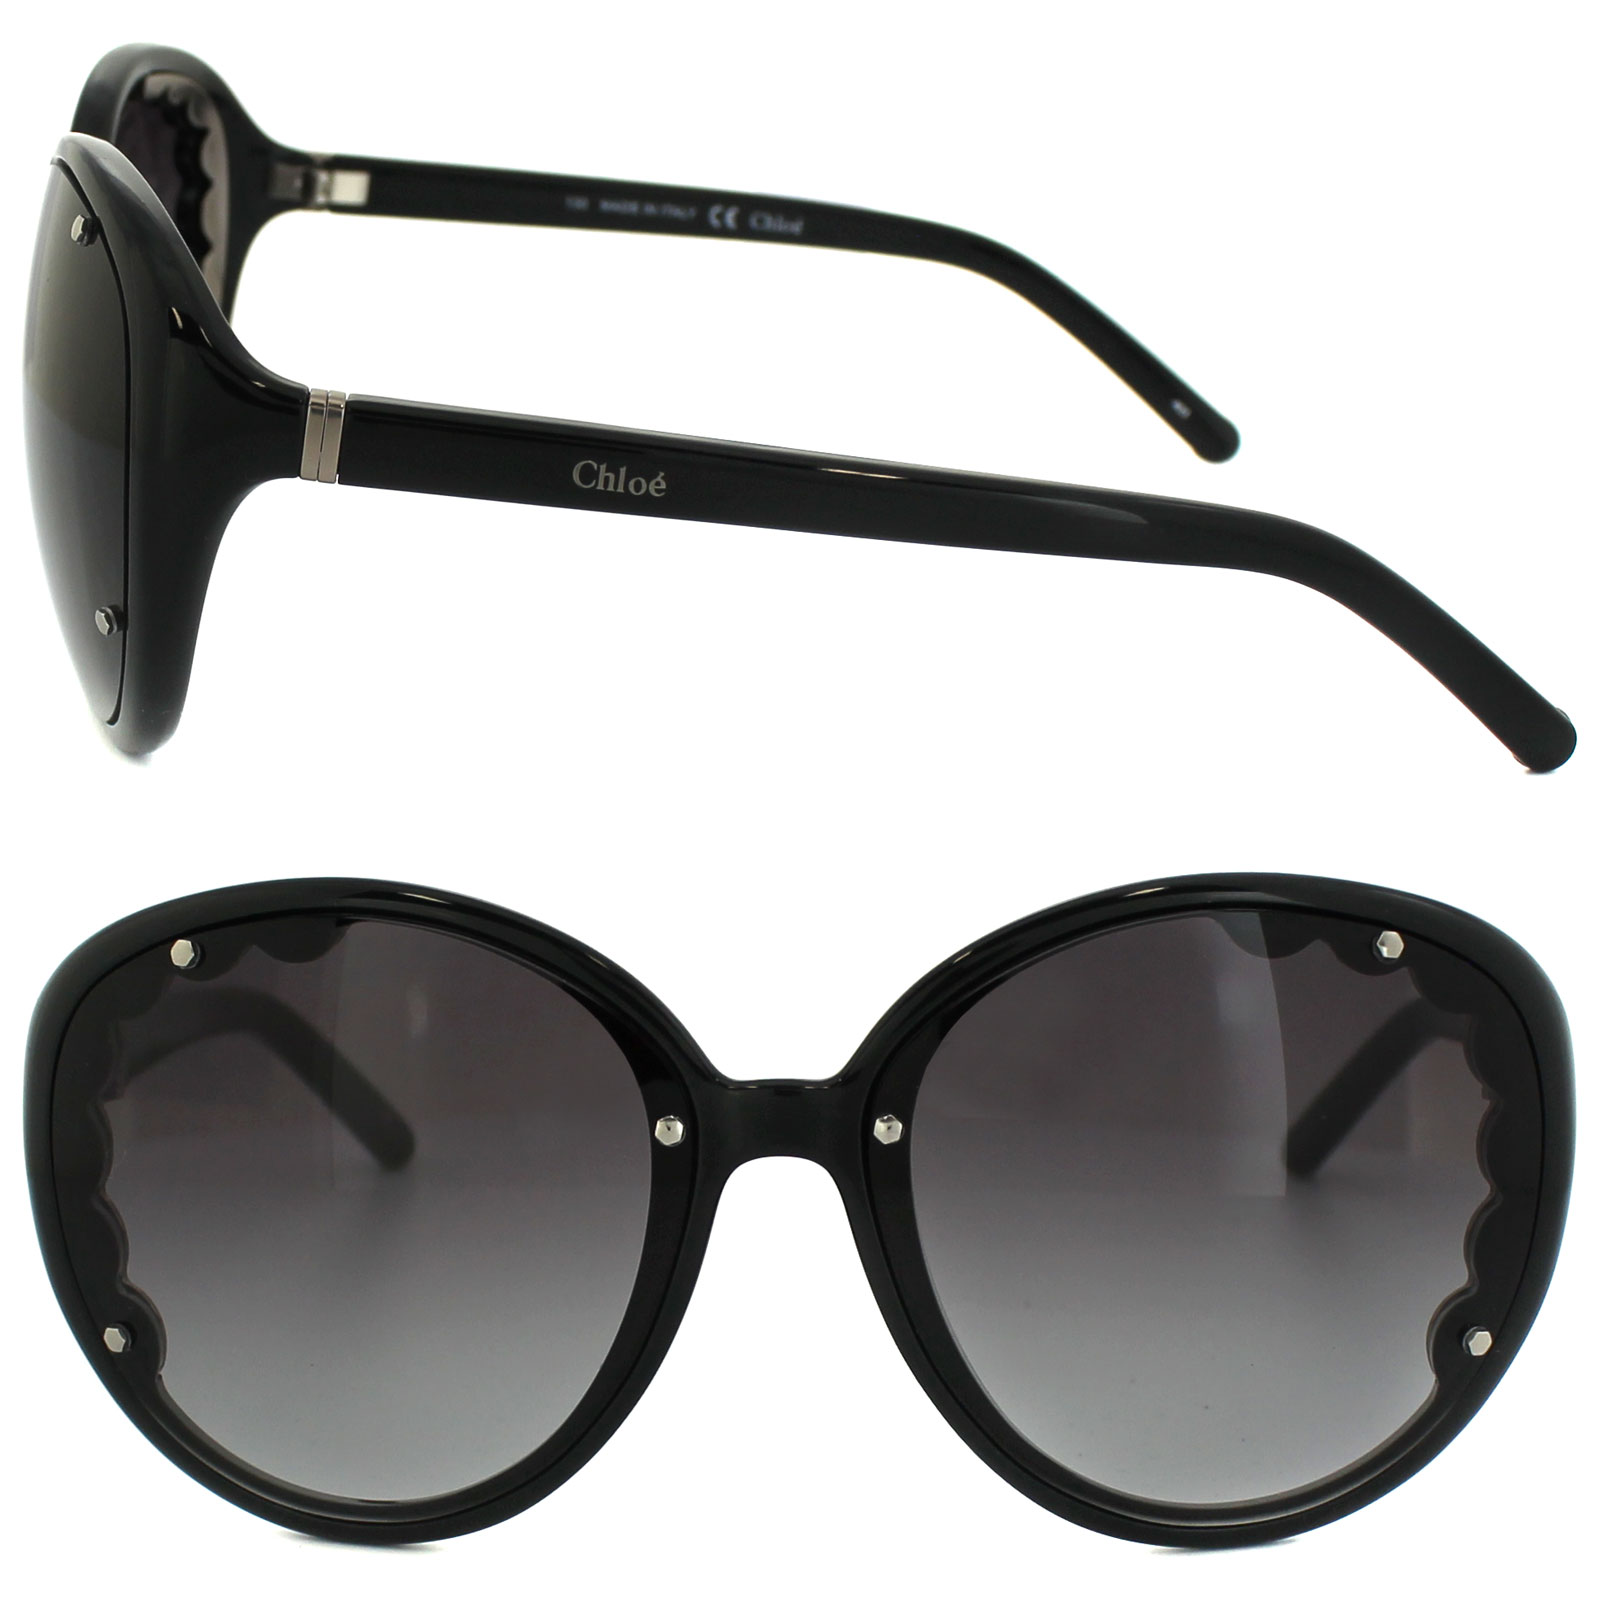 e7f42bcaa92 Chloe Sunglasses CE 652S 001 Black Black Gradient 883121963436